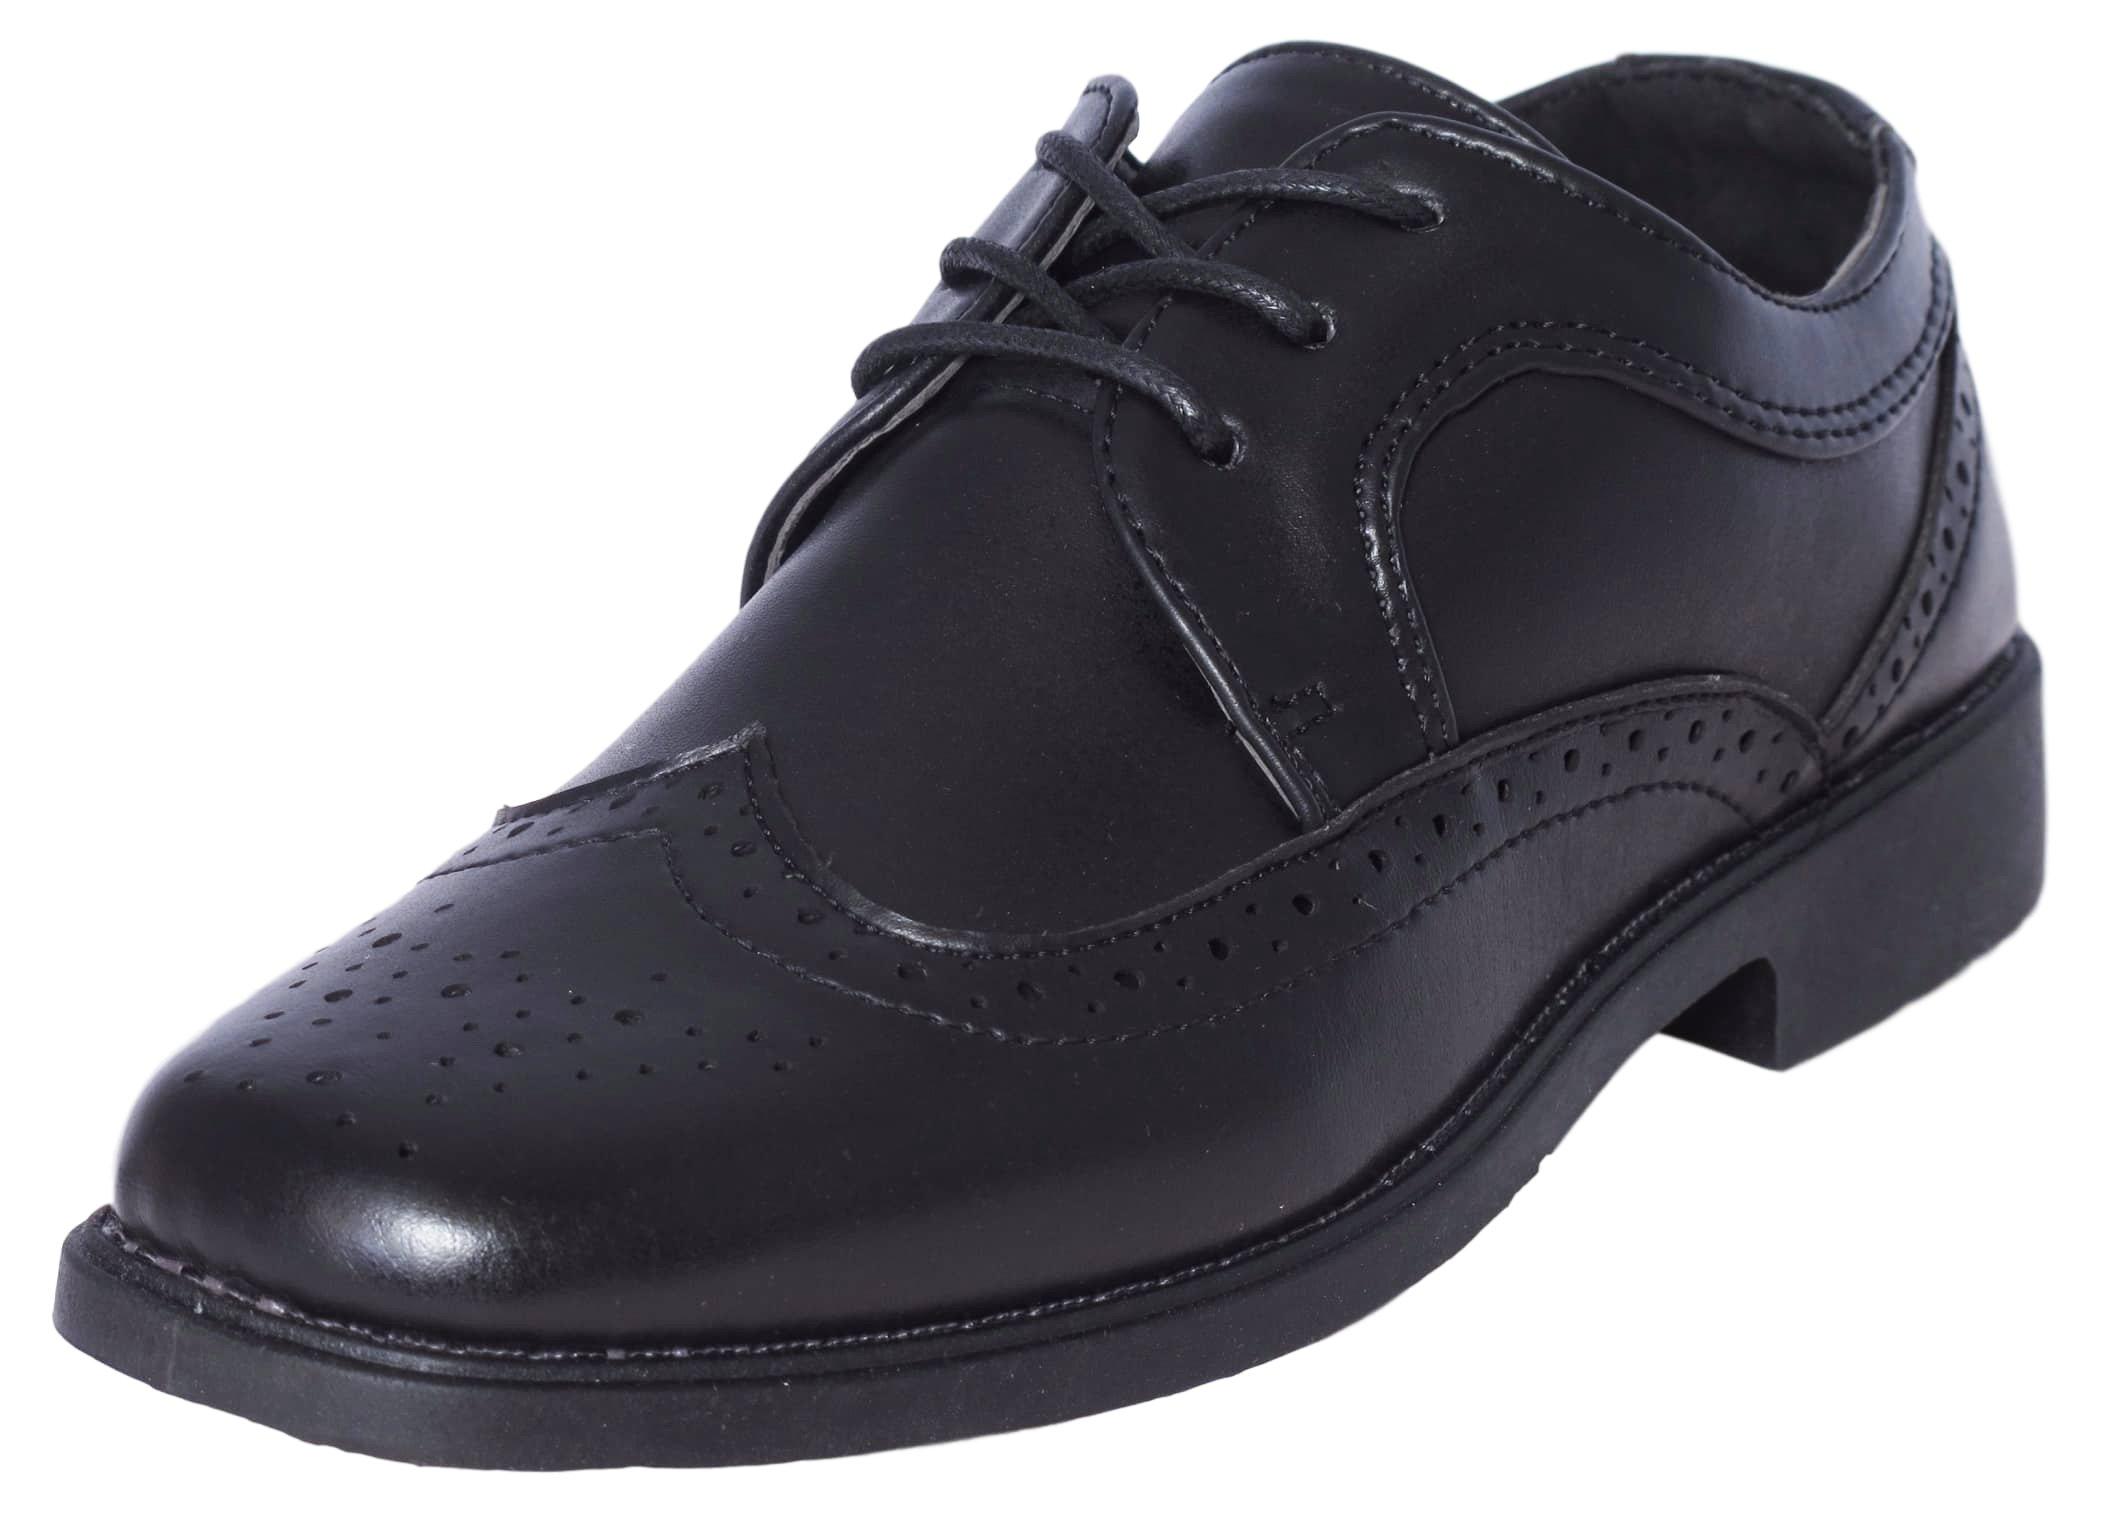 Josmo Boys Classic Comfort Dress Wing-Tip Oxford Shoe (Toddler, Little Kid, Big Kid), Black, Size 12'